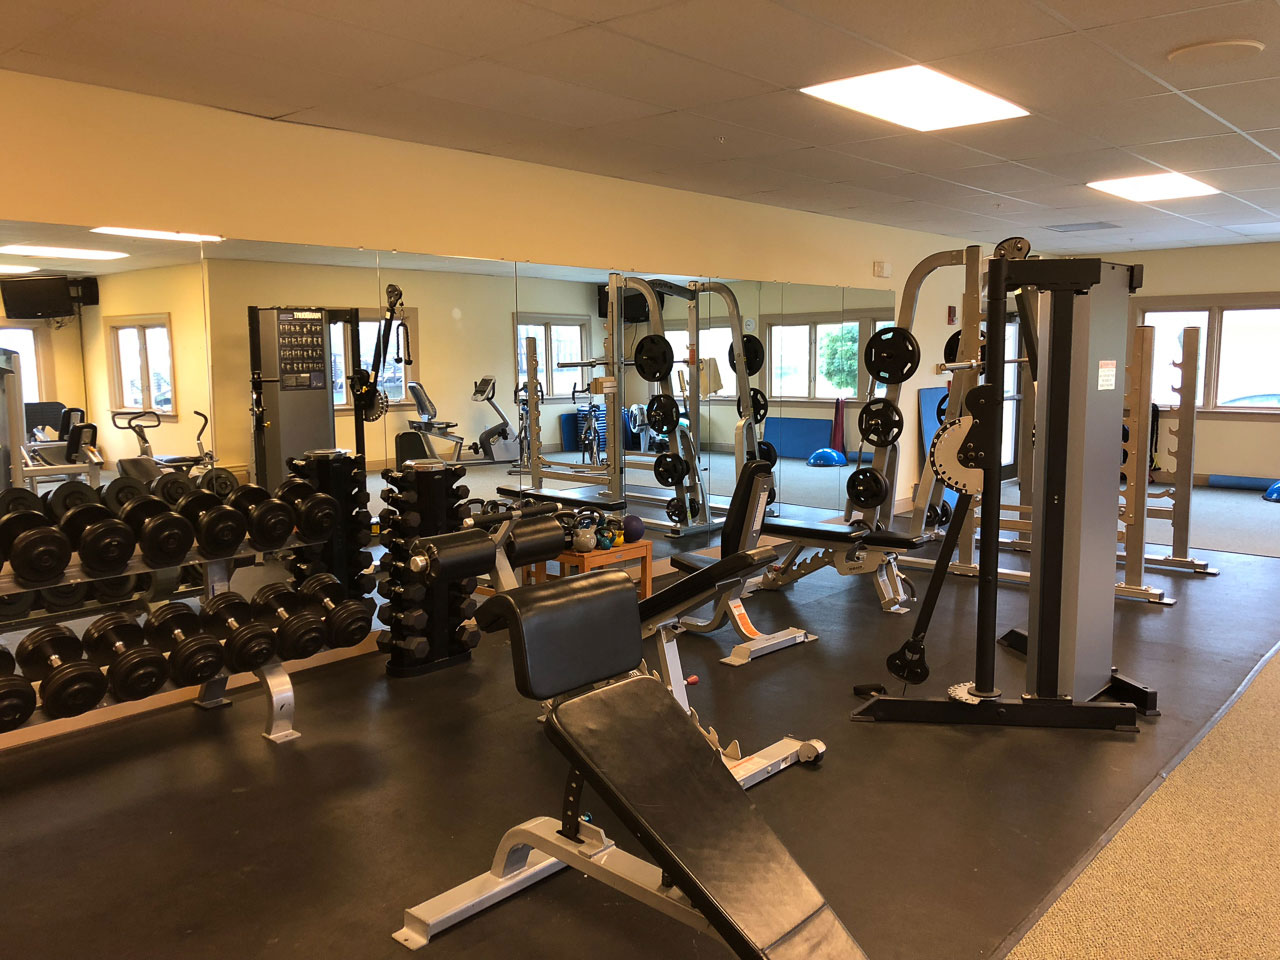 Killington Ski Resort Workout Center